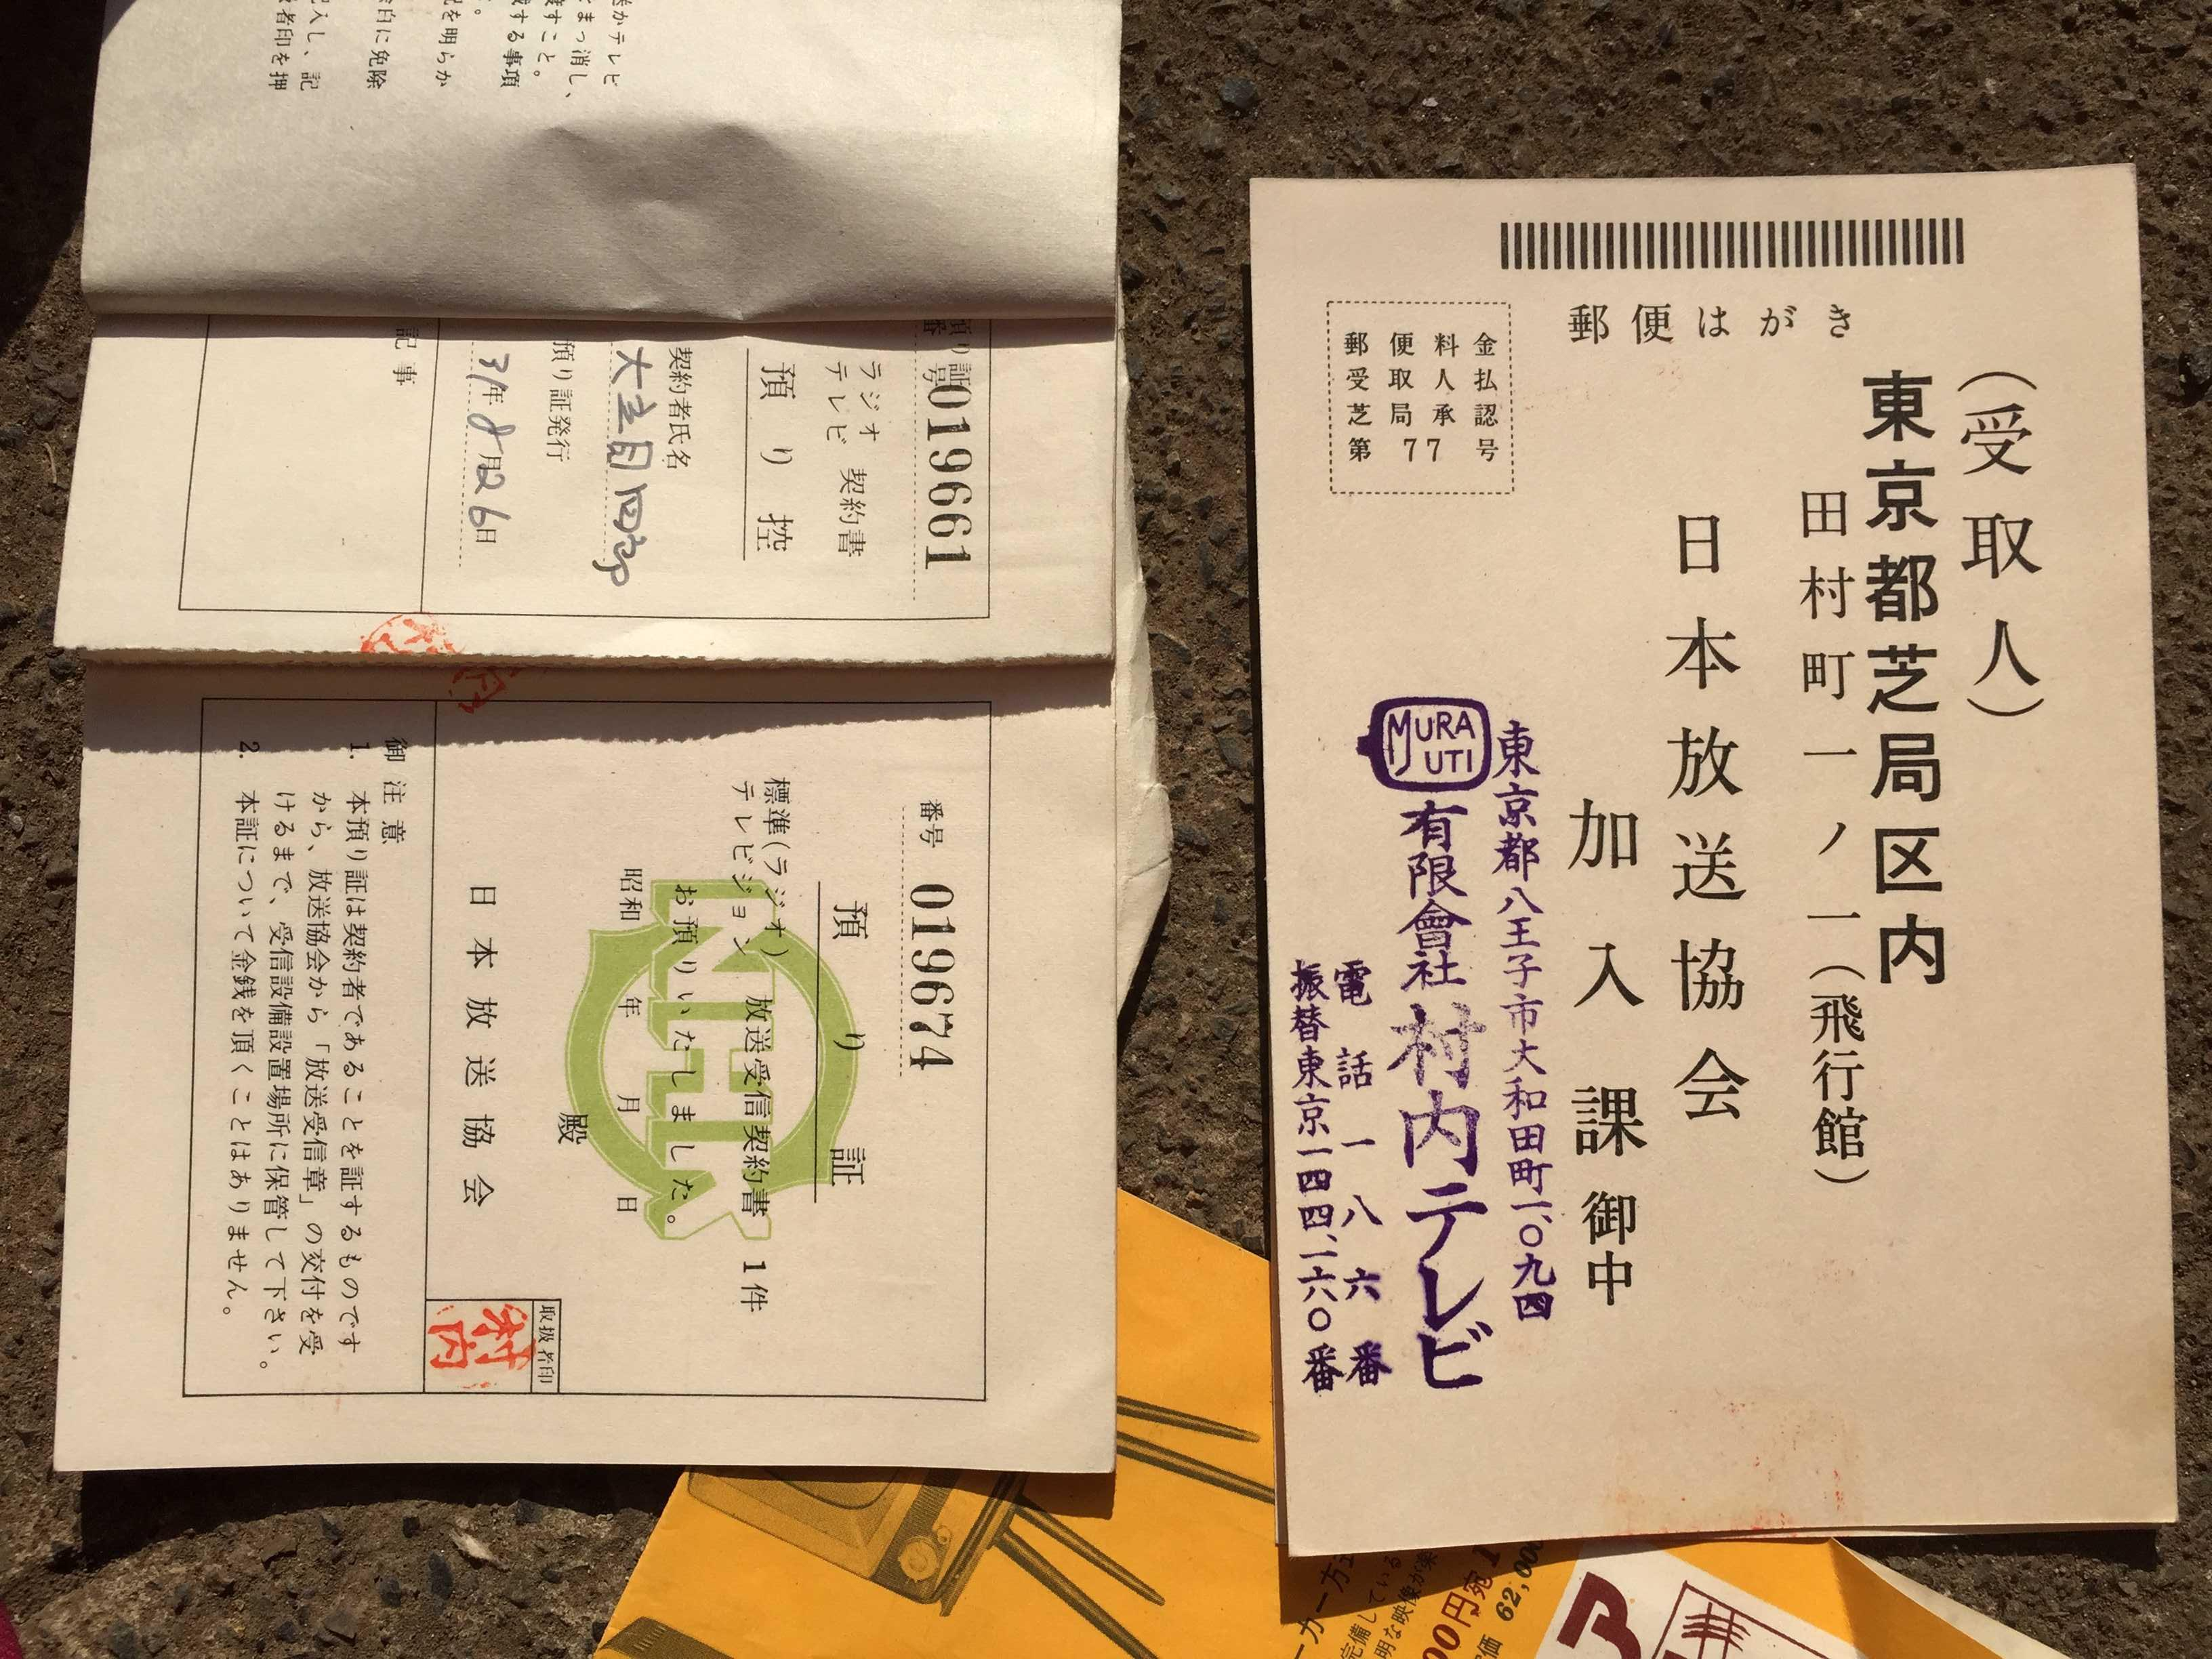 NHK(日本放送協会)の加入課へ差し出す郵便はがき